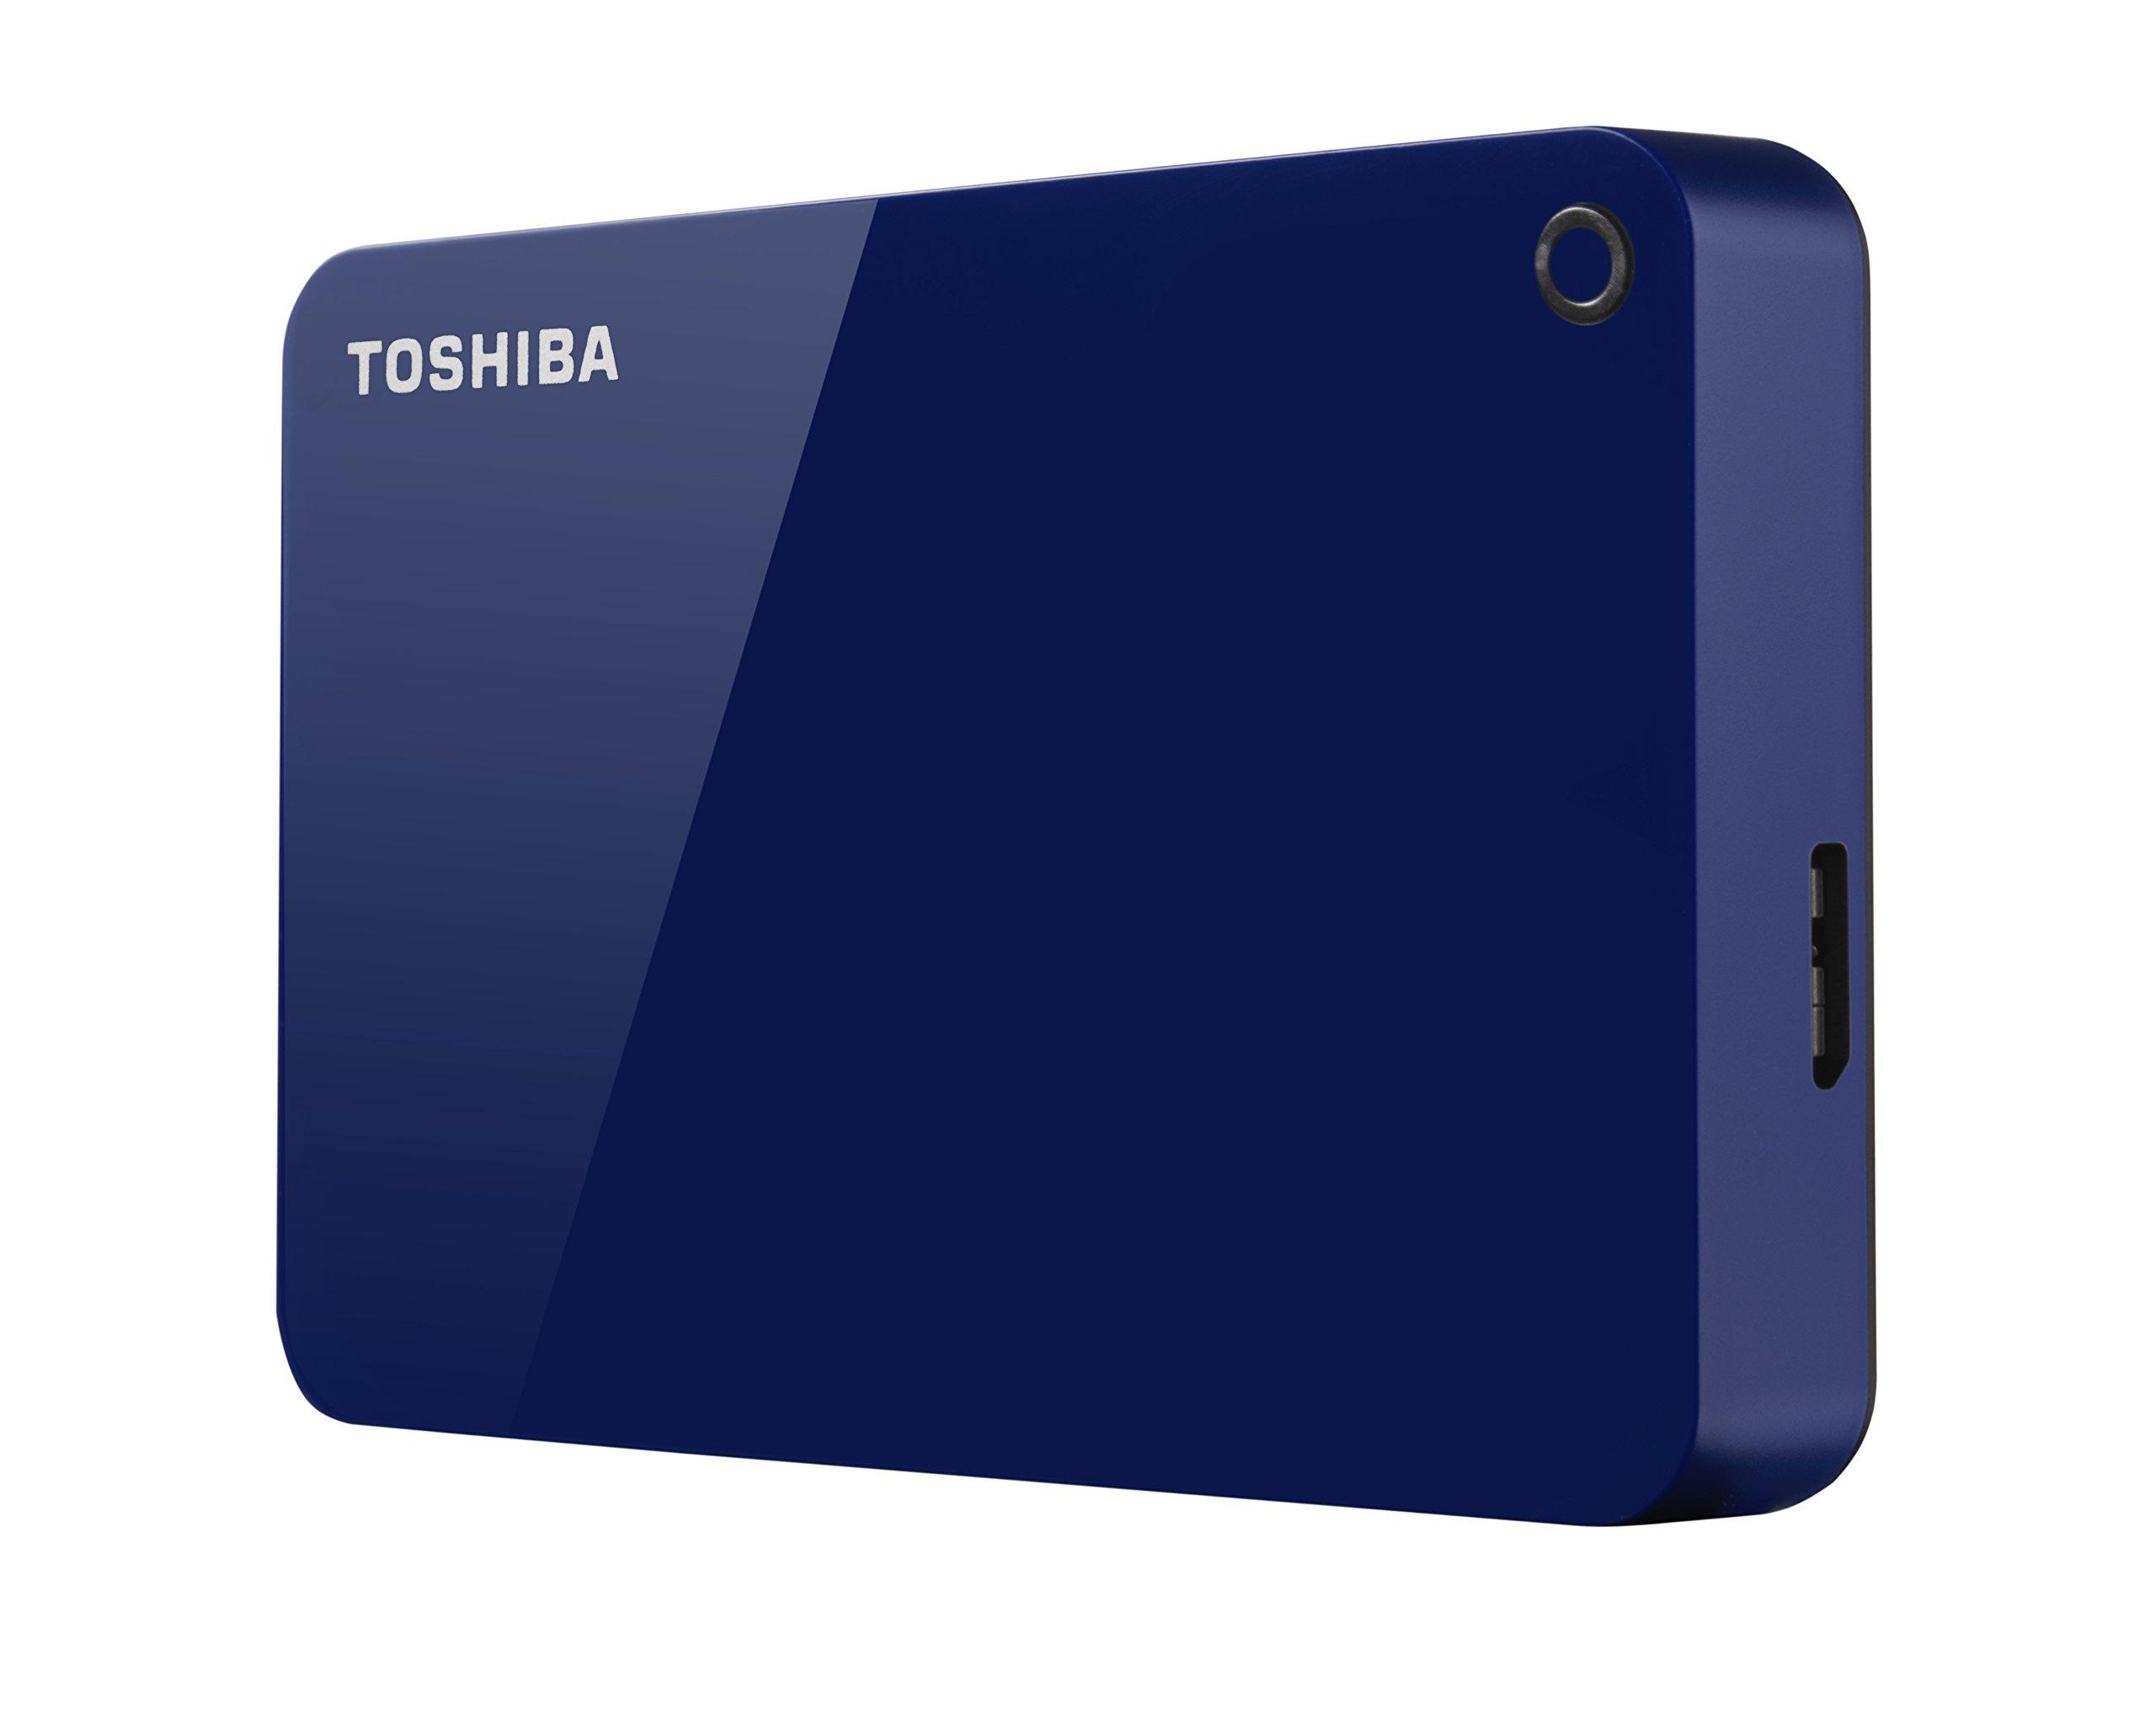 Toshiba Canvio Advance 4TB Portable External Hard Drive USB 3.0, Blue (HDTC940XL3CA) by Toshiba (Image #3)